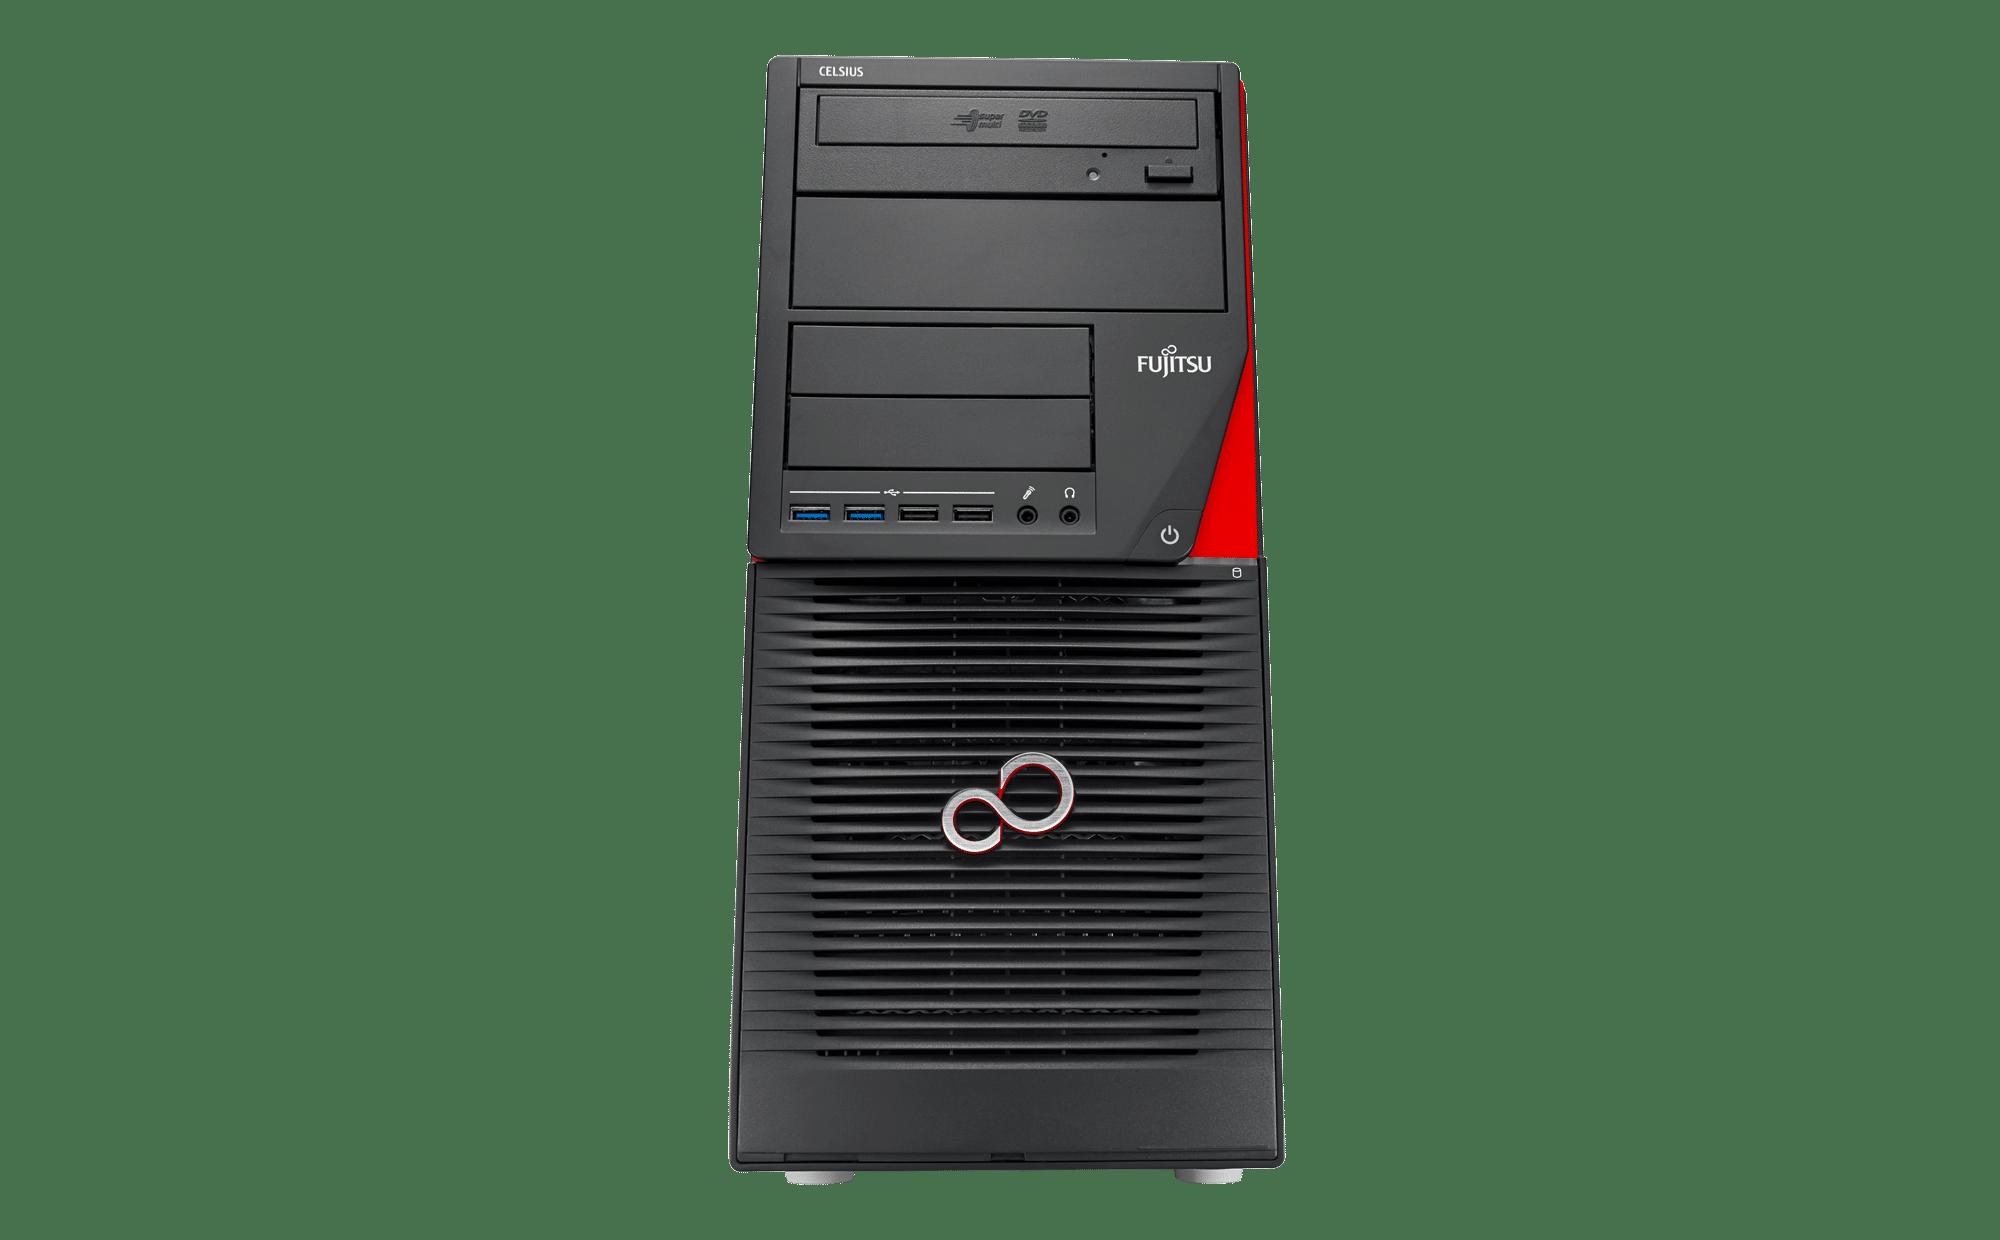 Fujitsu CELSIUS W550 munkaállomás